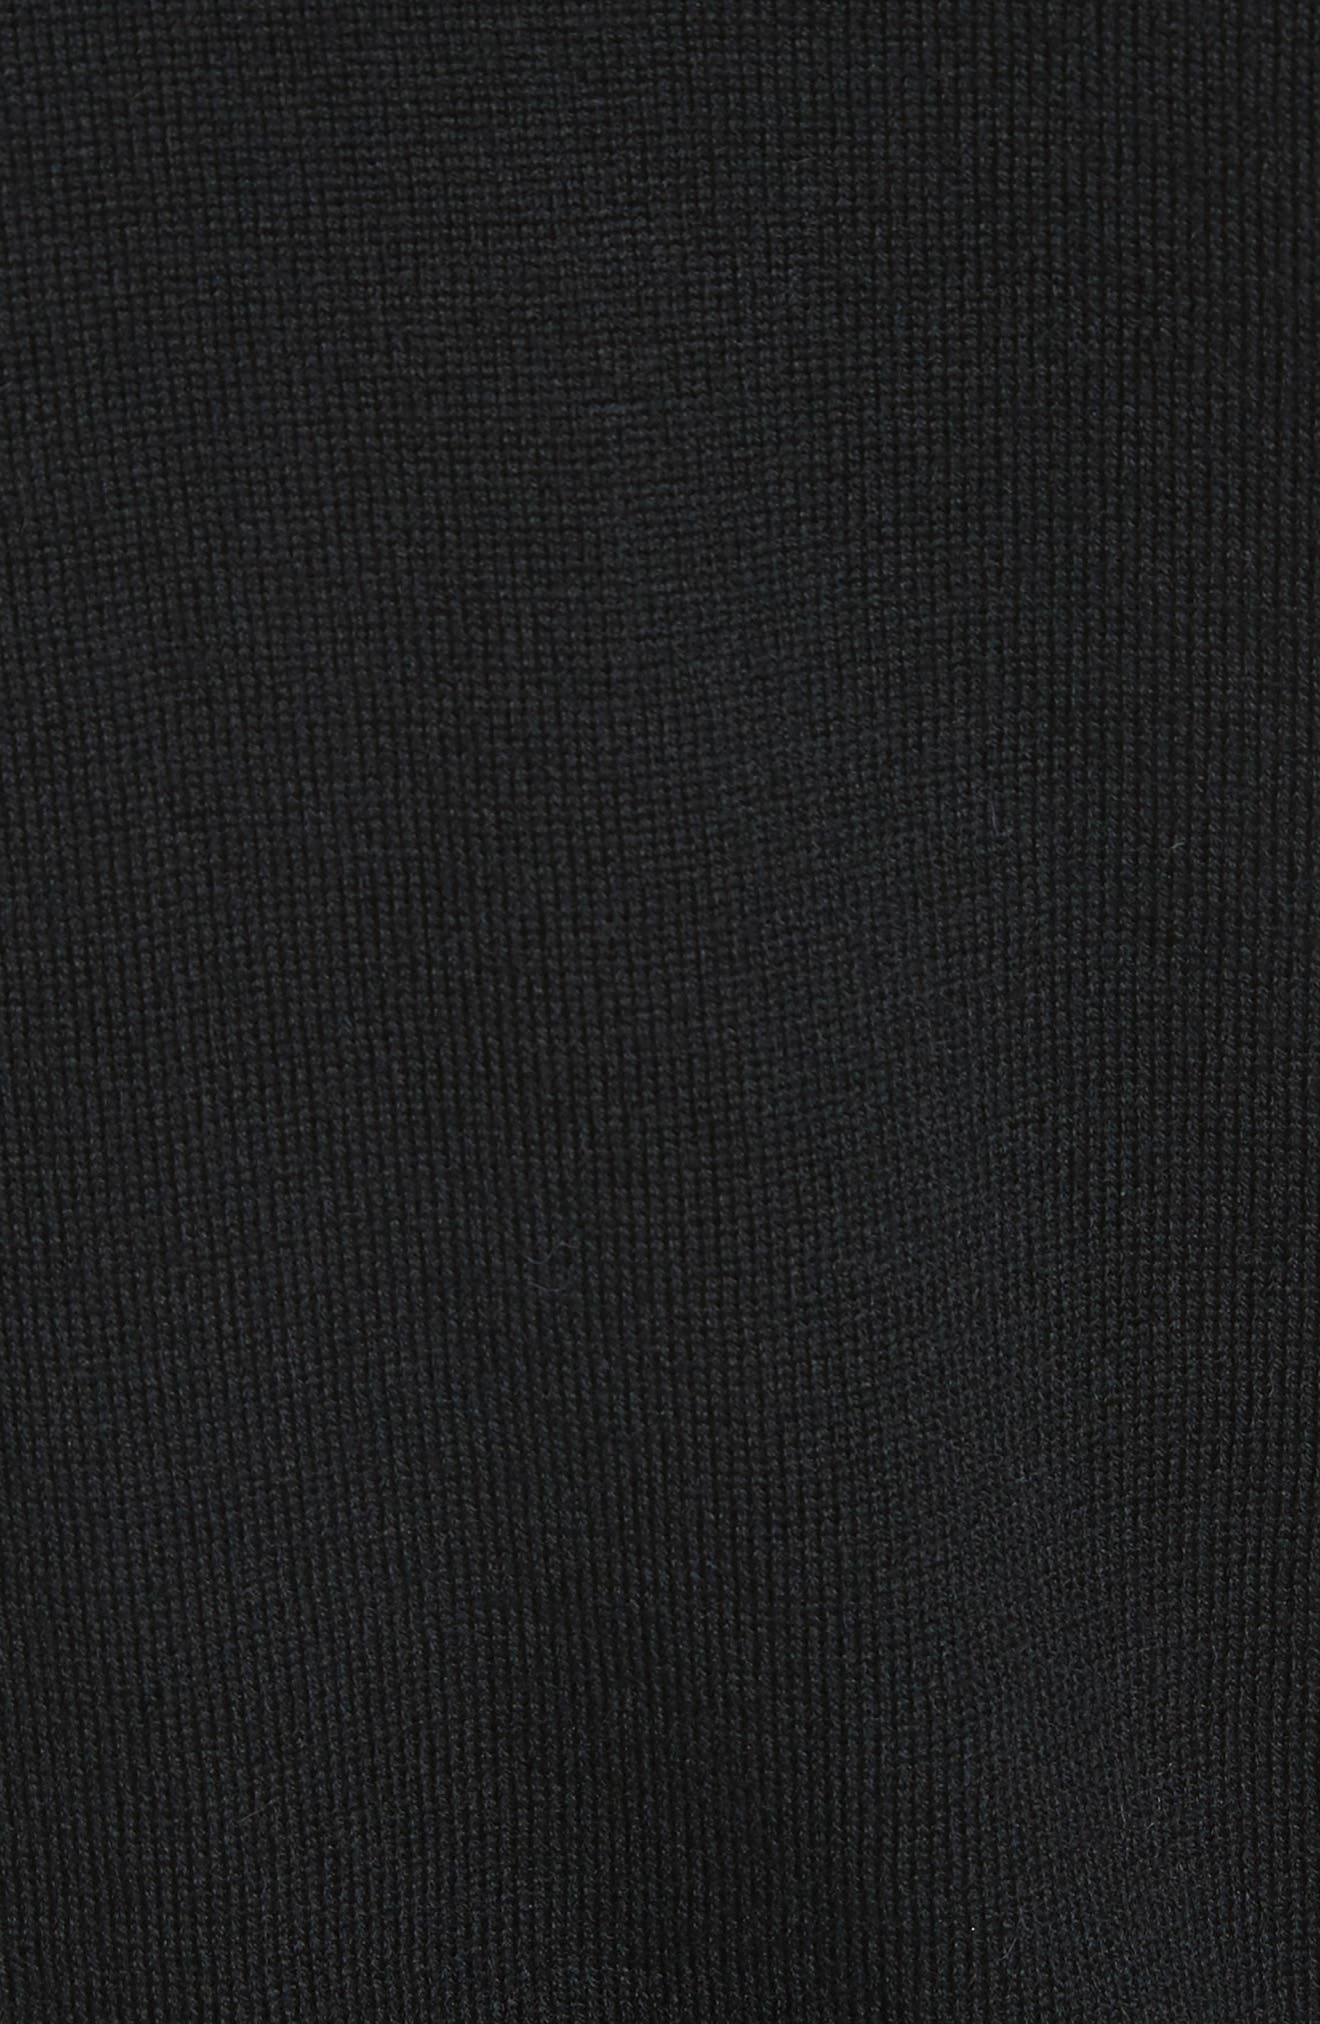 Beaded Wool Sweater with Genuine Rabbit Fur Trim,                             Alternate thumbnail 5, color,                             Black